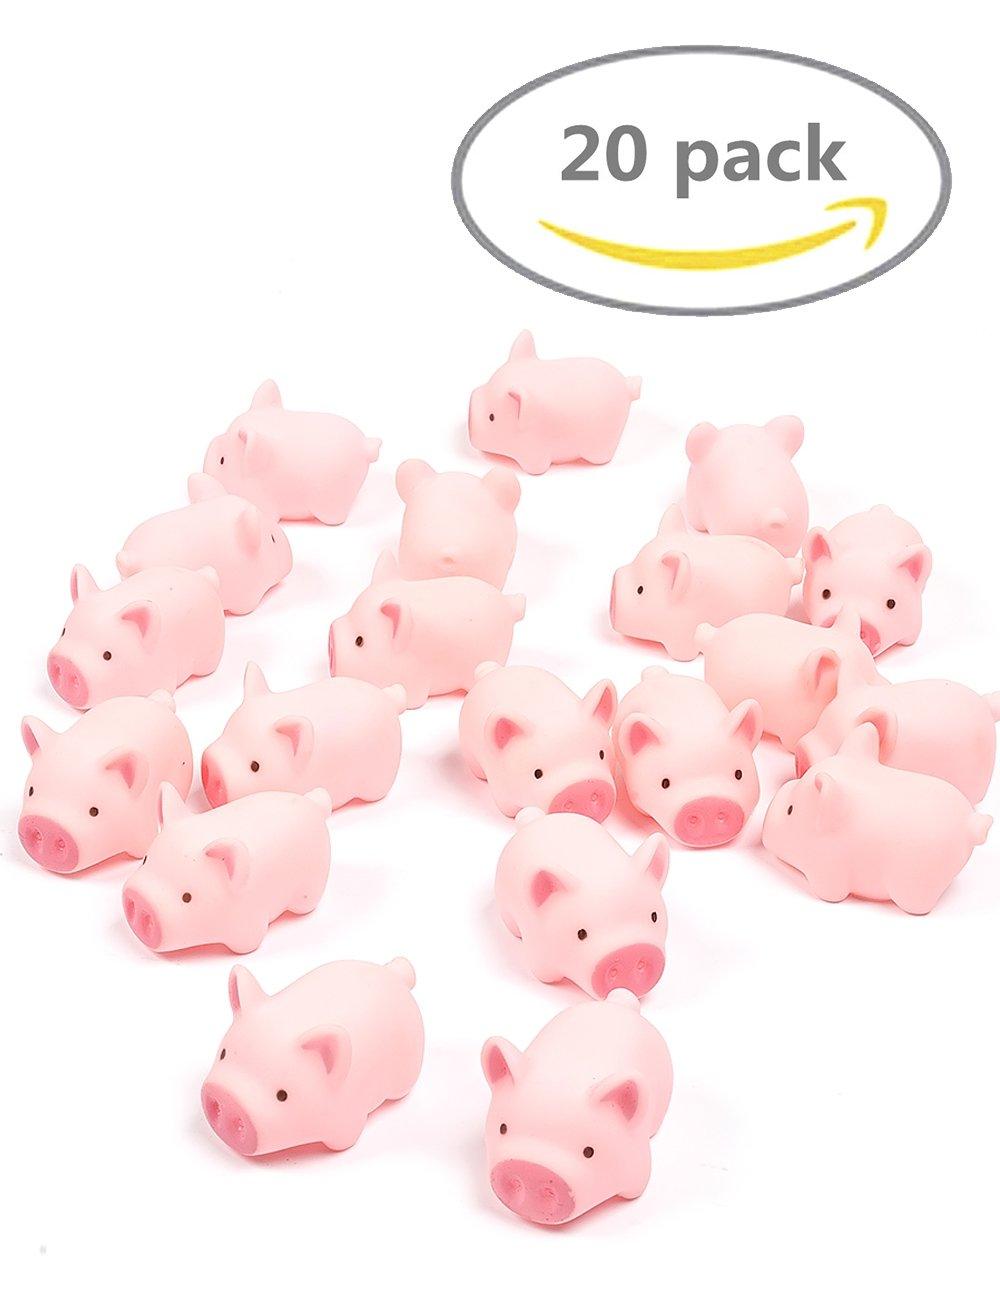 Juguete del ba o del beb del cerdo del colch envio - Juguetes bano bebe ...